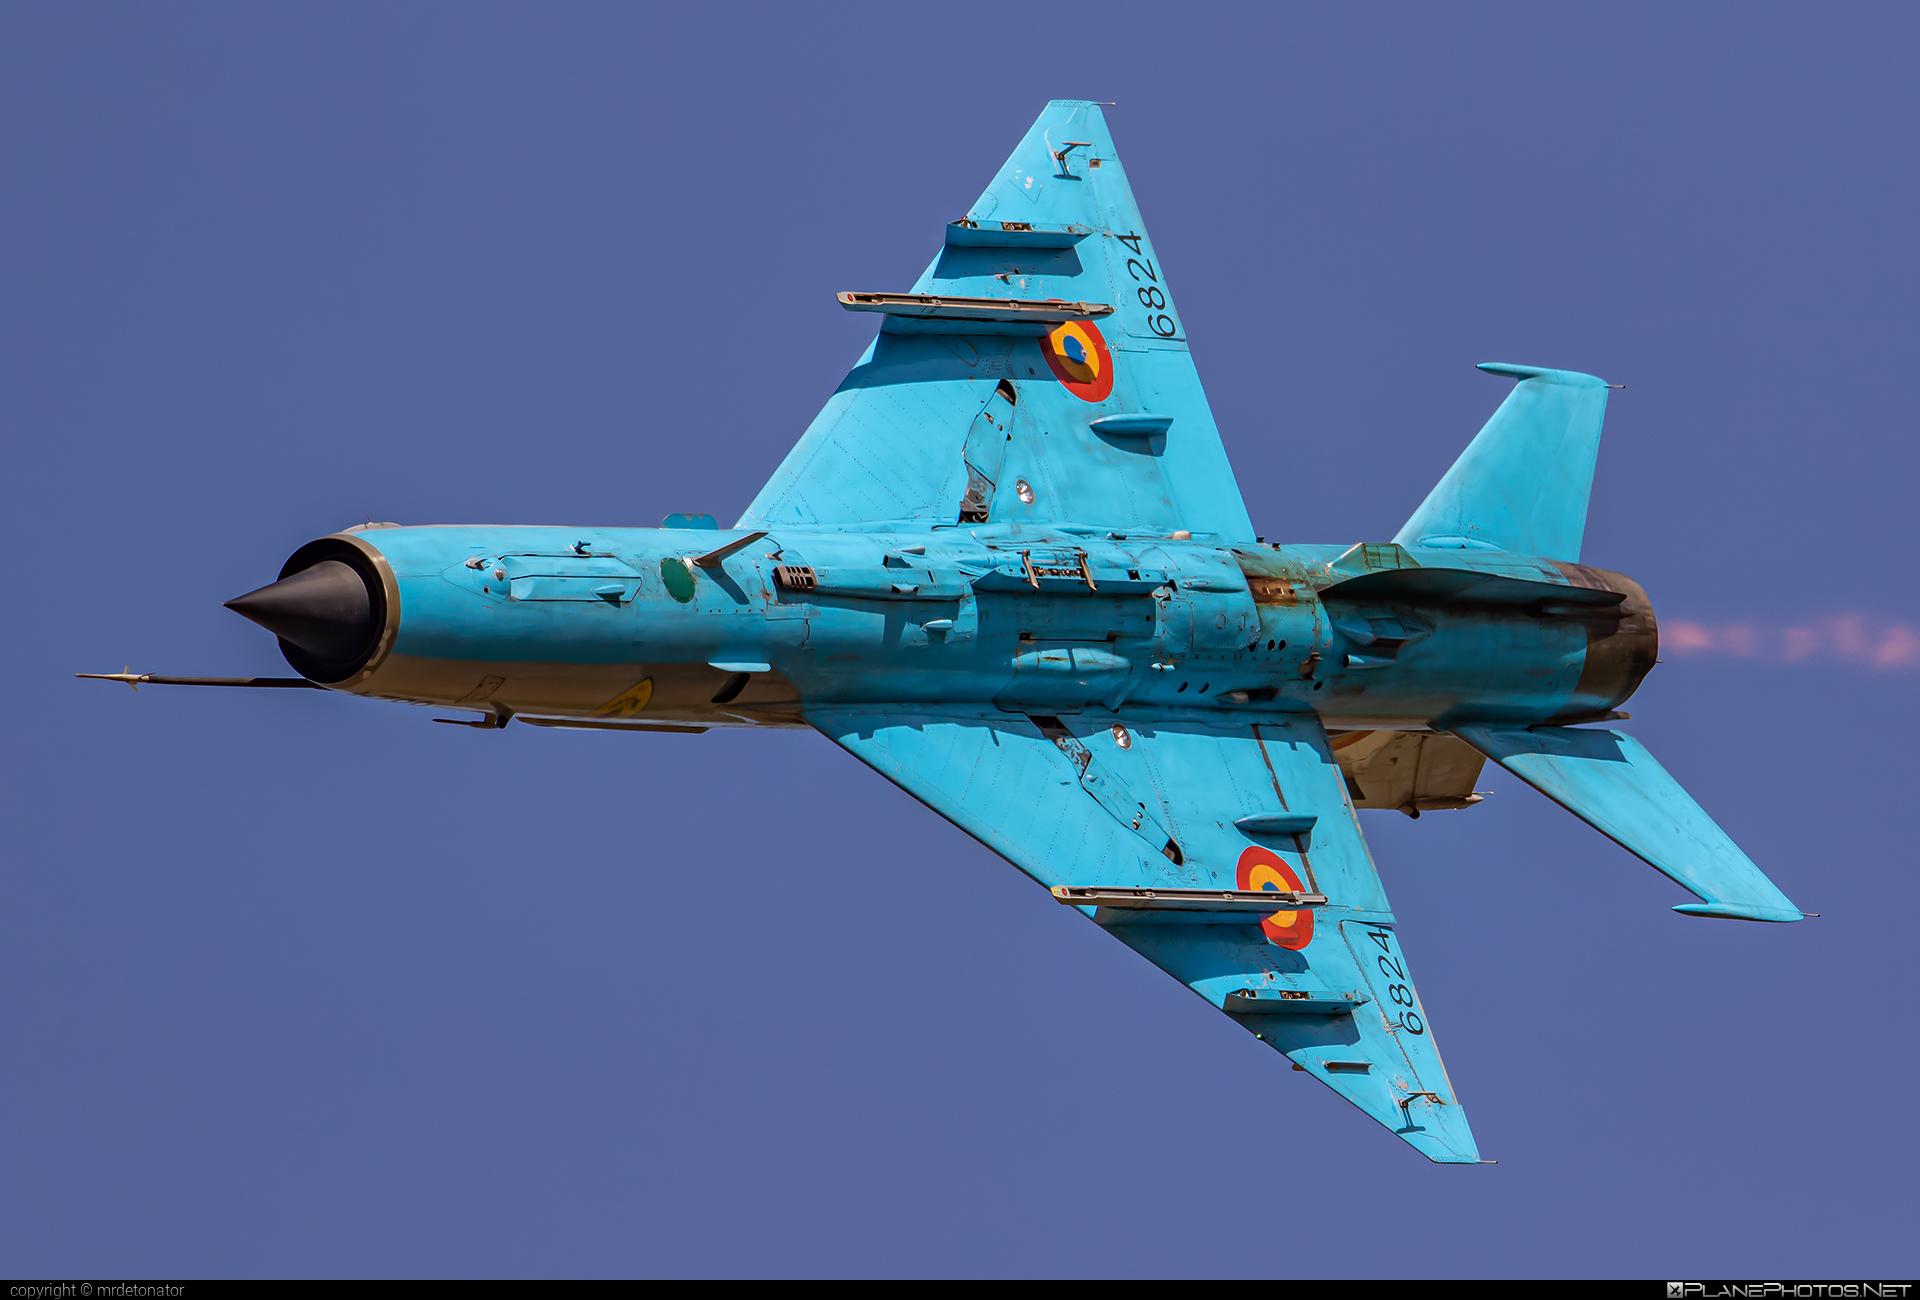 Mikoyan-Gurevich MiG-21MF - 6824 operated by Forţele Aeriene Române (Romanian Air Force) #forteleaerieneromane #mig #mig21 #mig21mf #mikoyangurevich #natodays2019 #romanianairforce